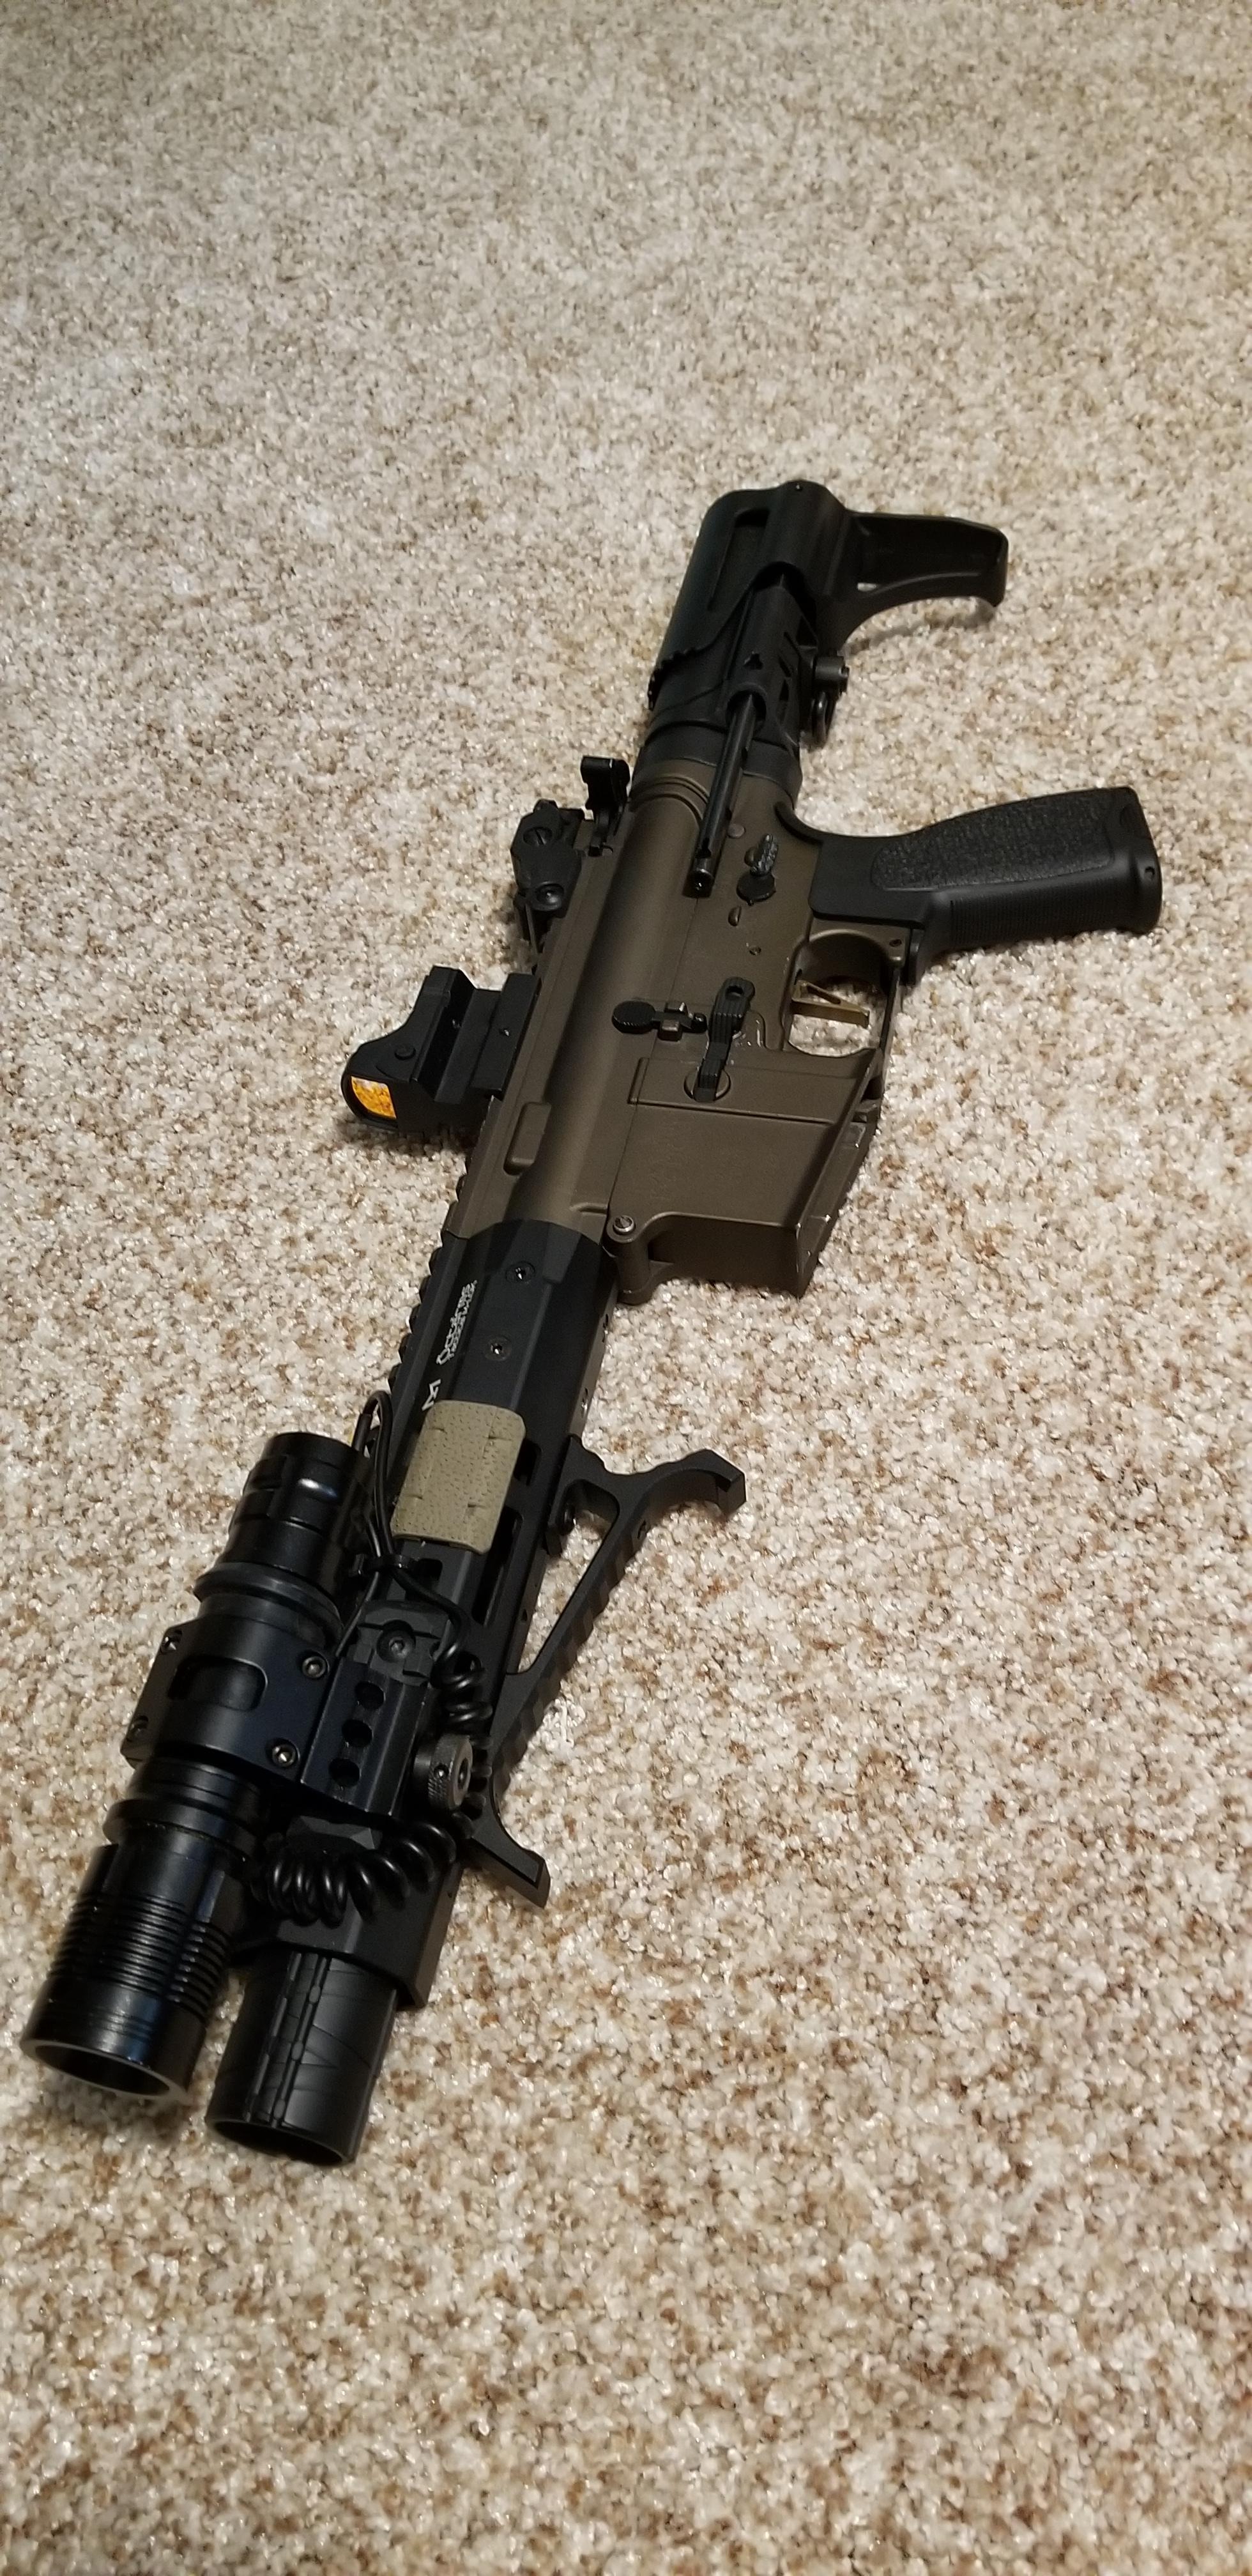 my suitcase gun build